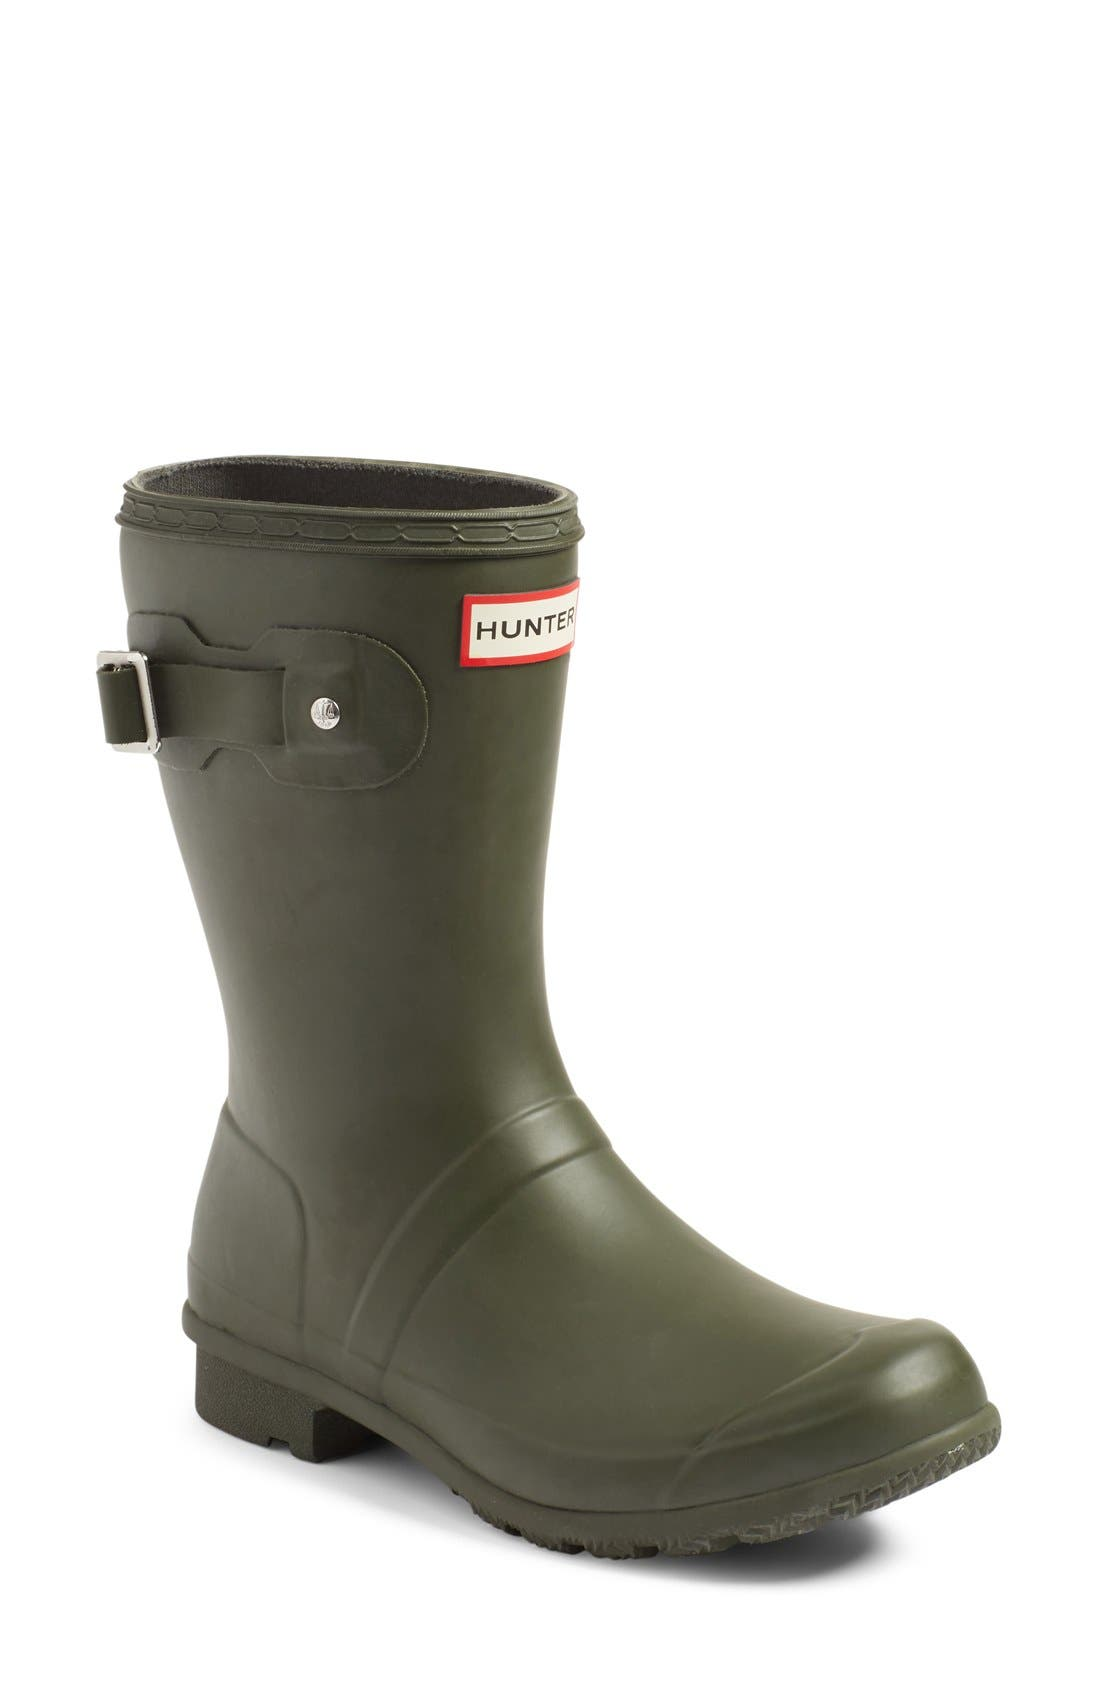 Main Image - Hunter Original Tour Short Packable Rain Boot (Women)